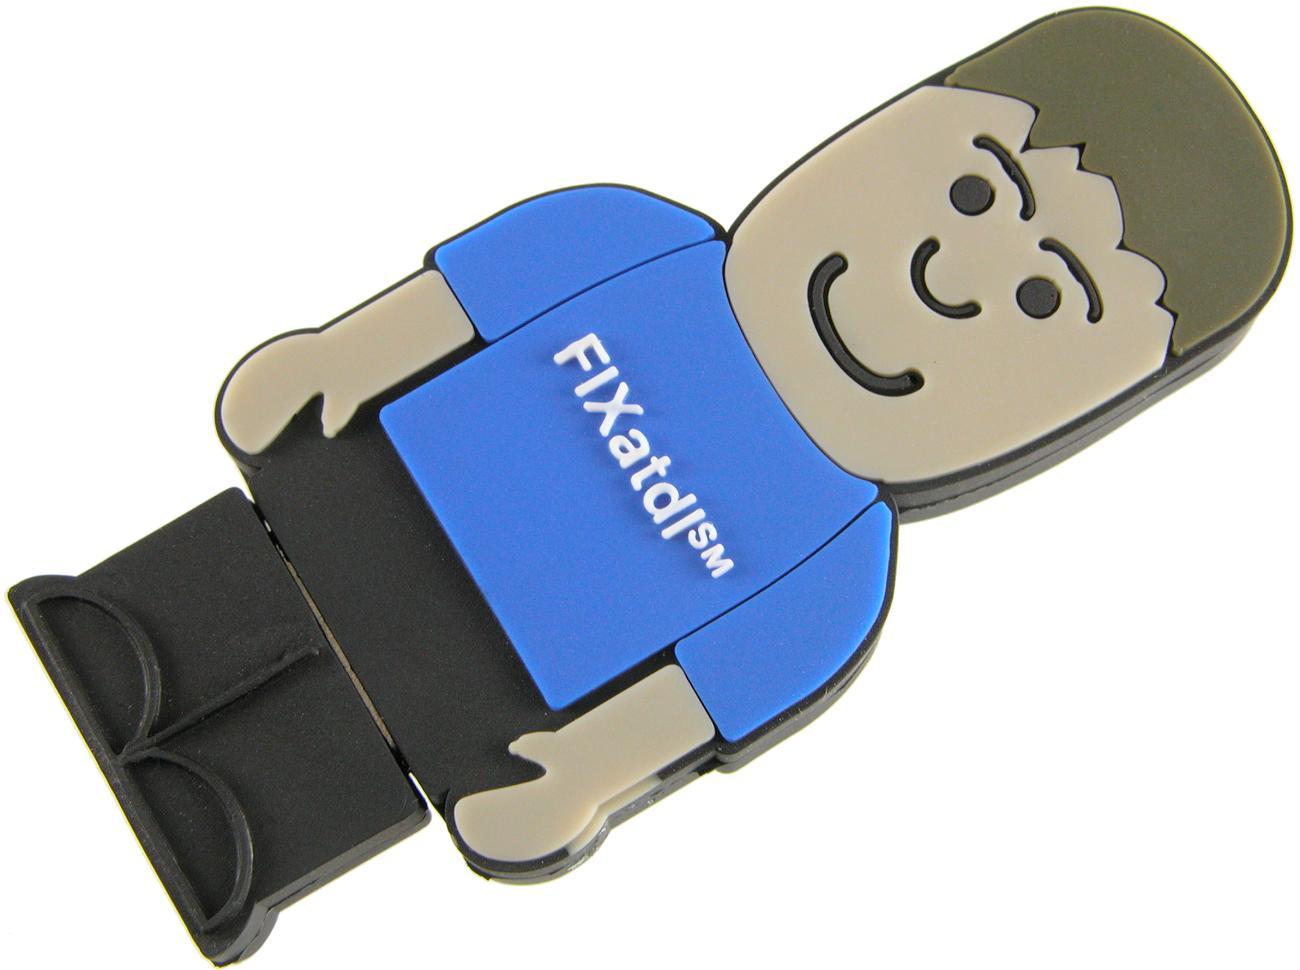 Usb Man Character Novelty Memory Stick Cd254